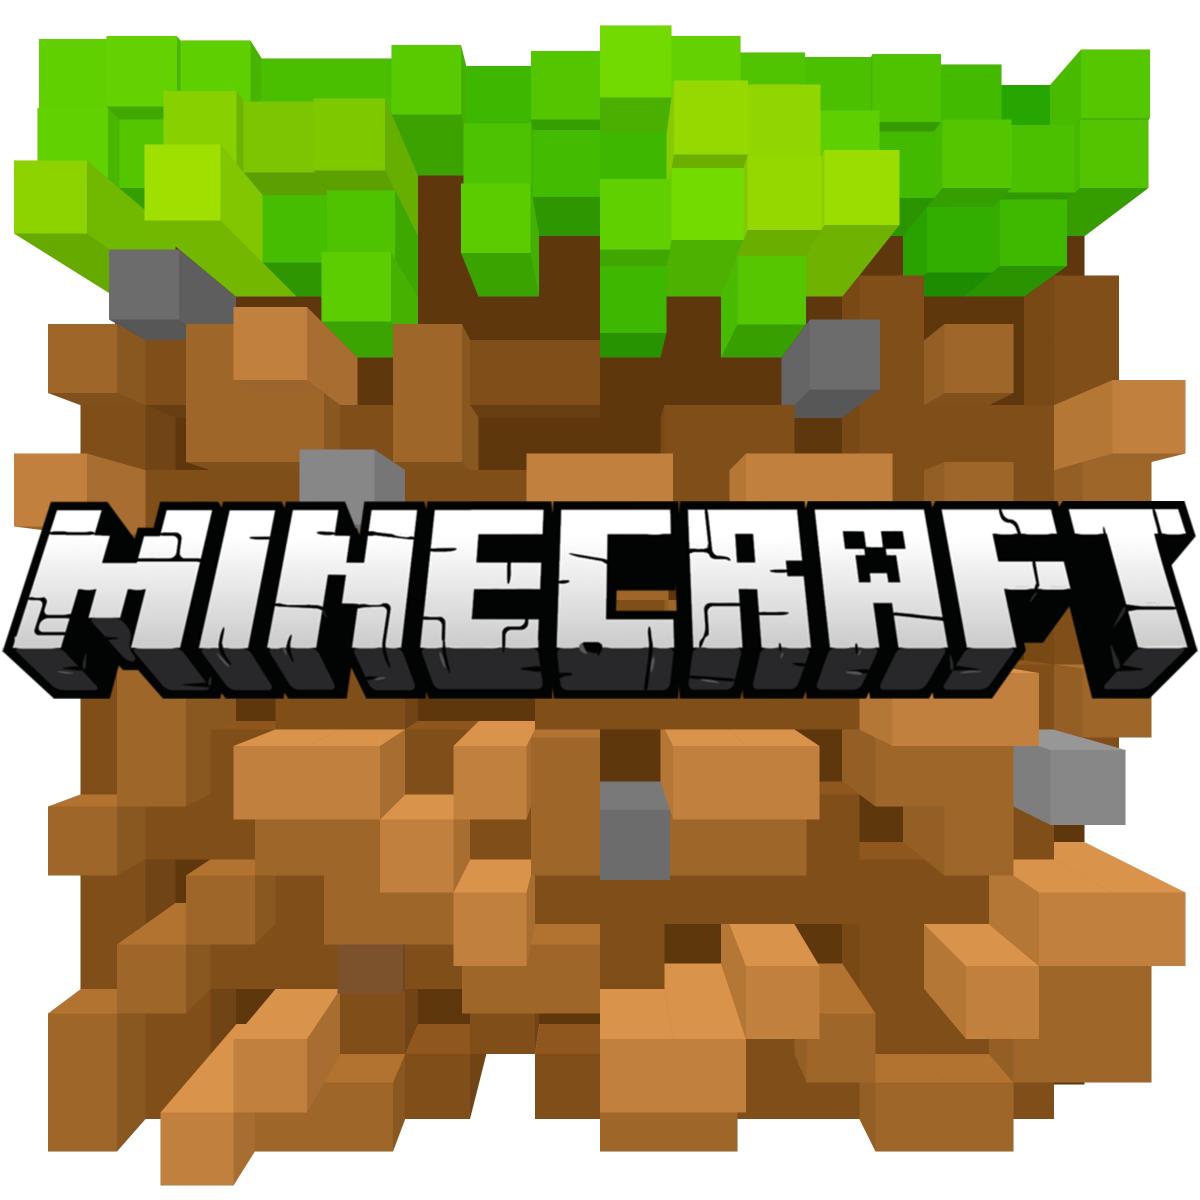 Minecraft gift shop - Where can i buy a flex belt